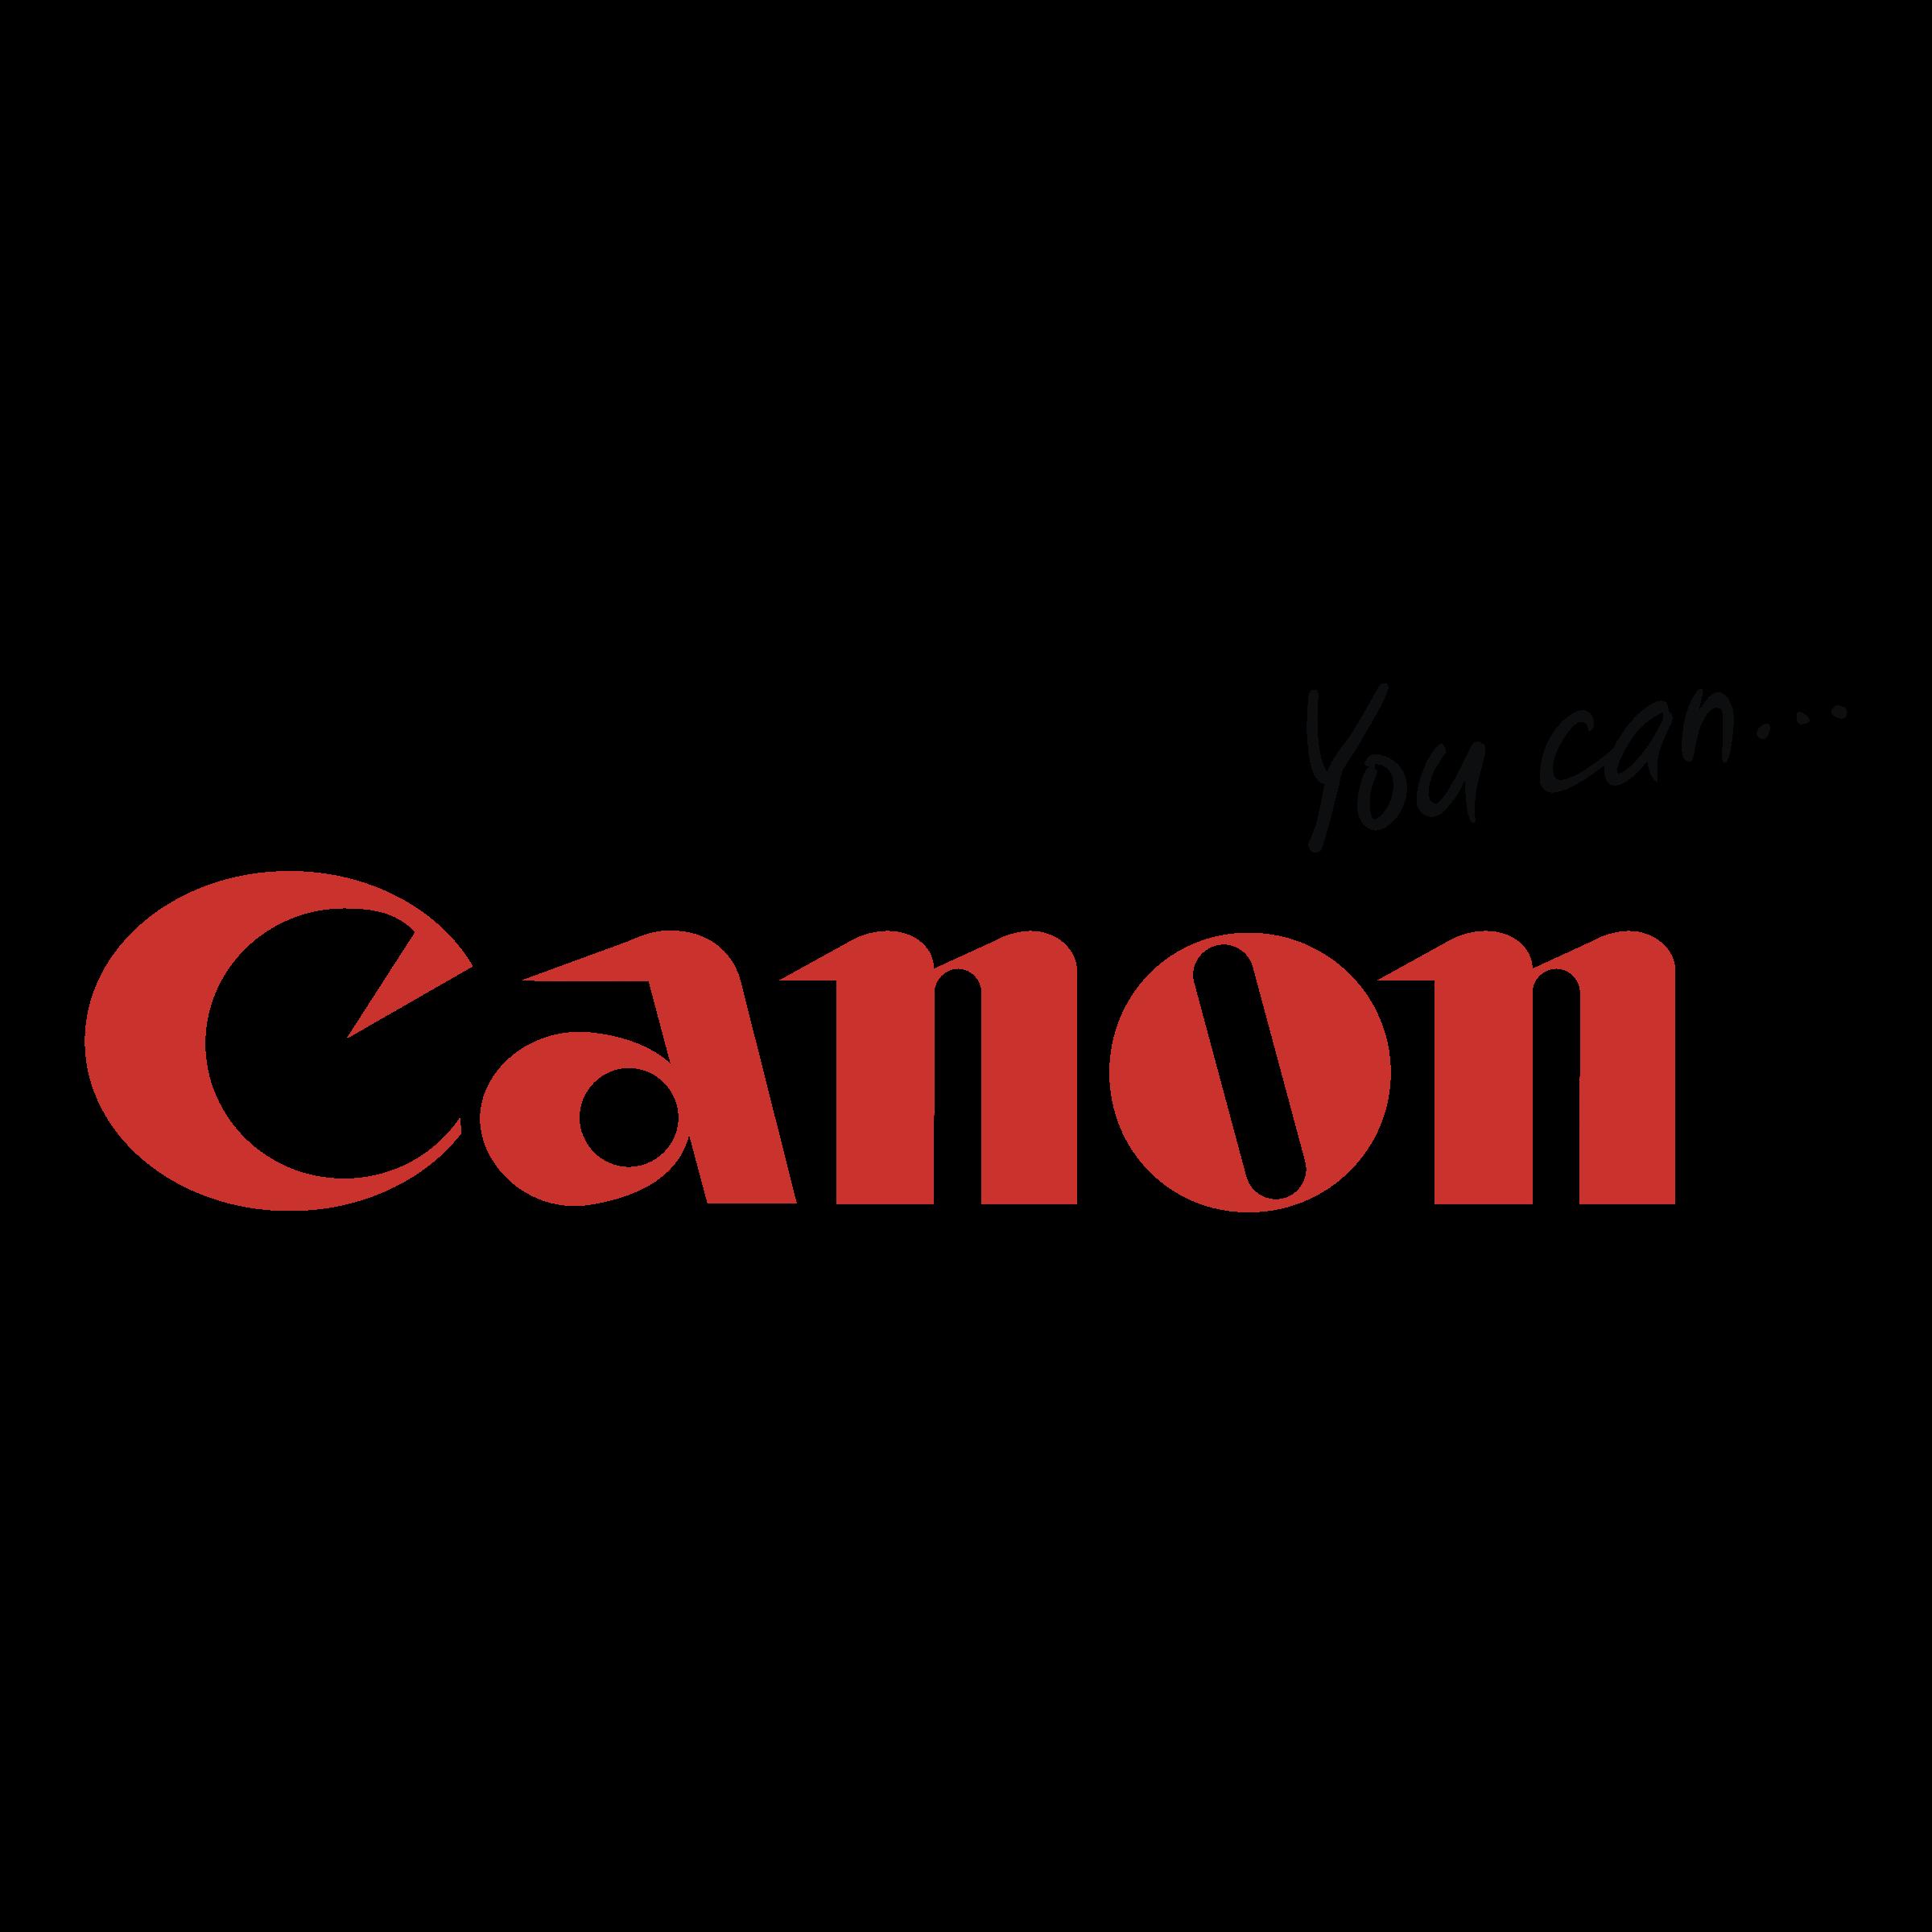 Canon Logo PNG Transparent & SVG Vector.